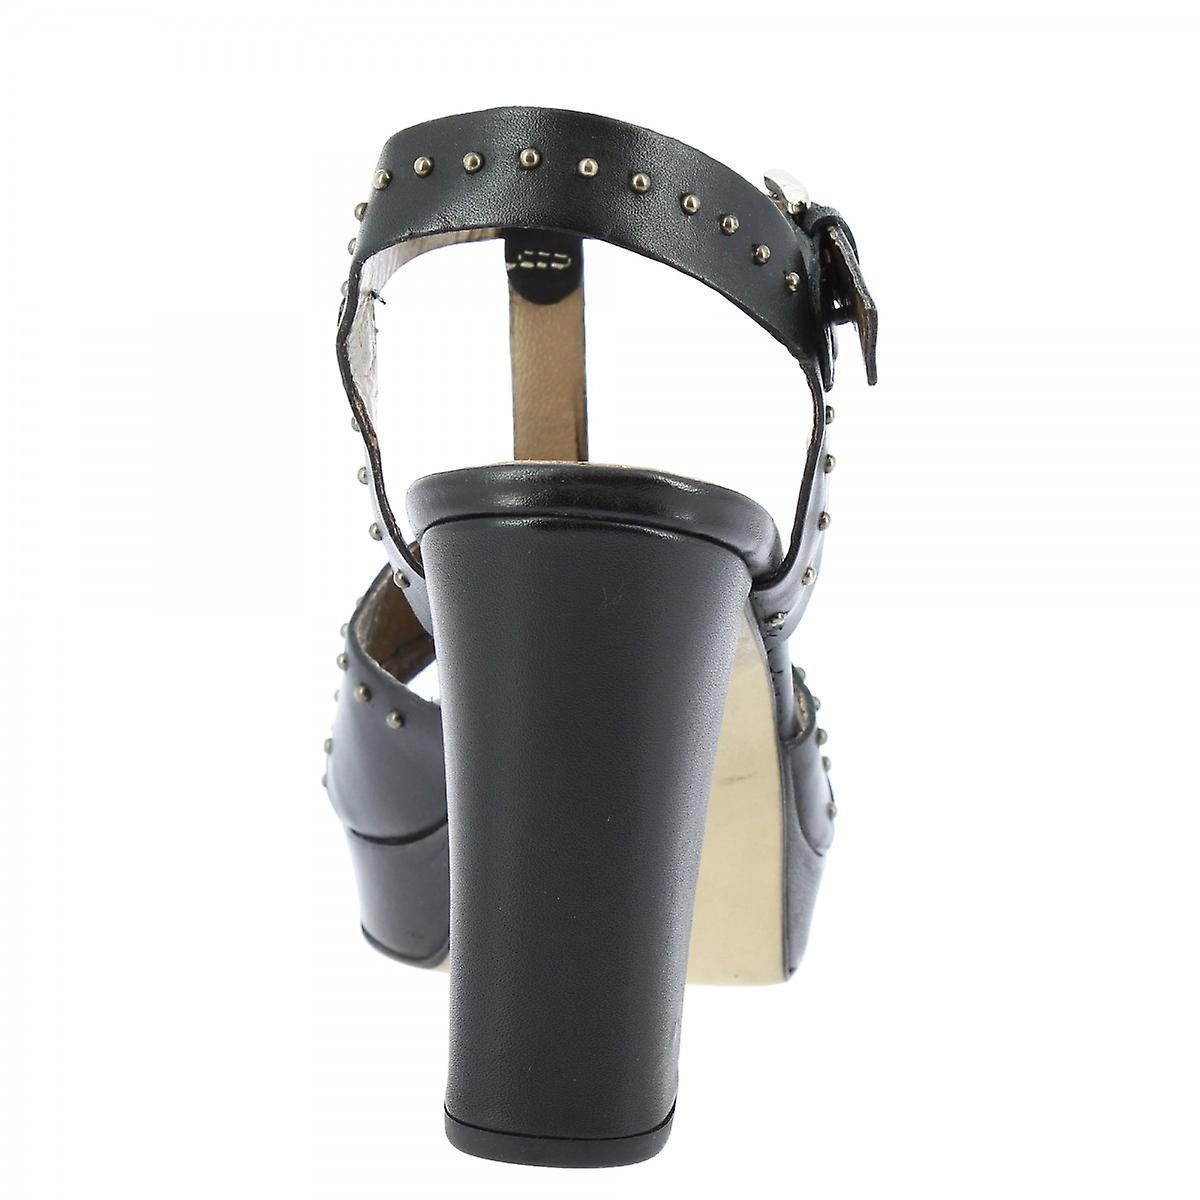 Leonardo Shoes Women's handmade heels platform sandals in black leather buckle gZfsB